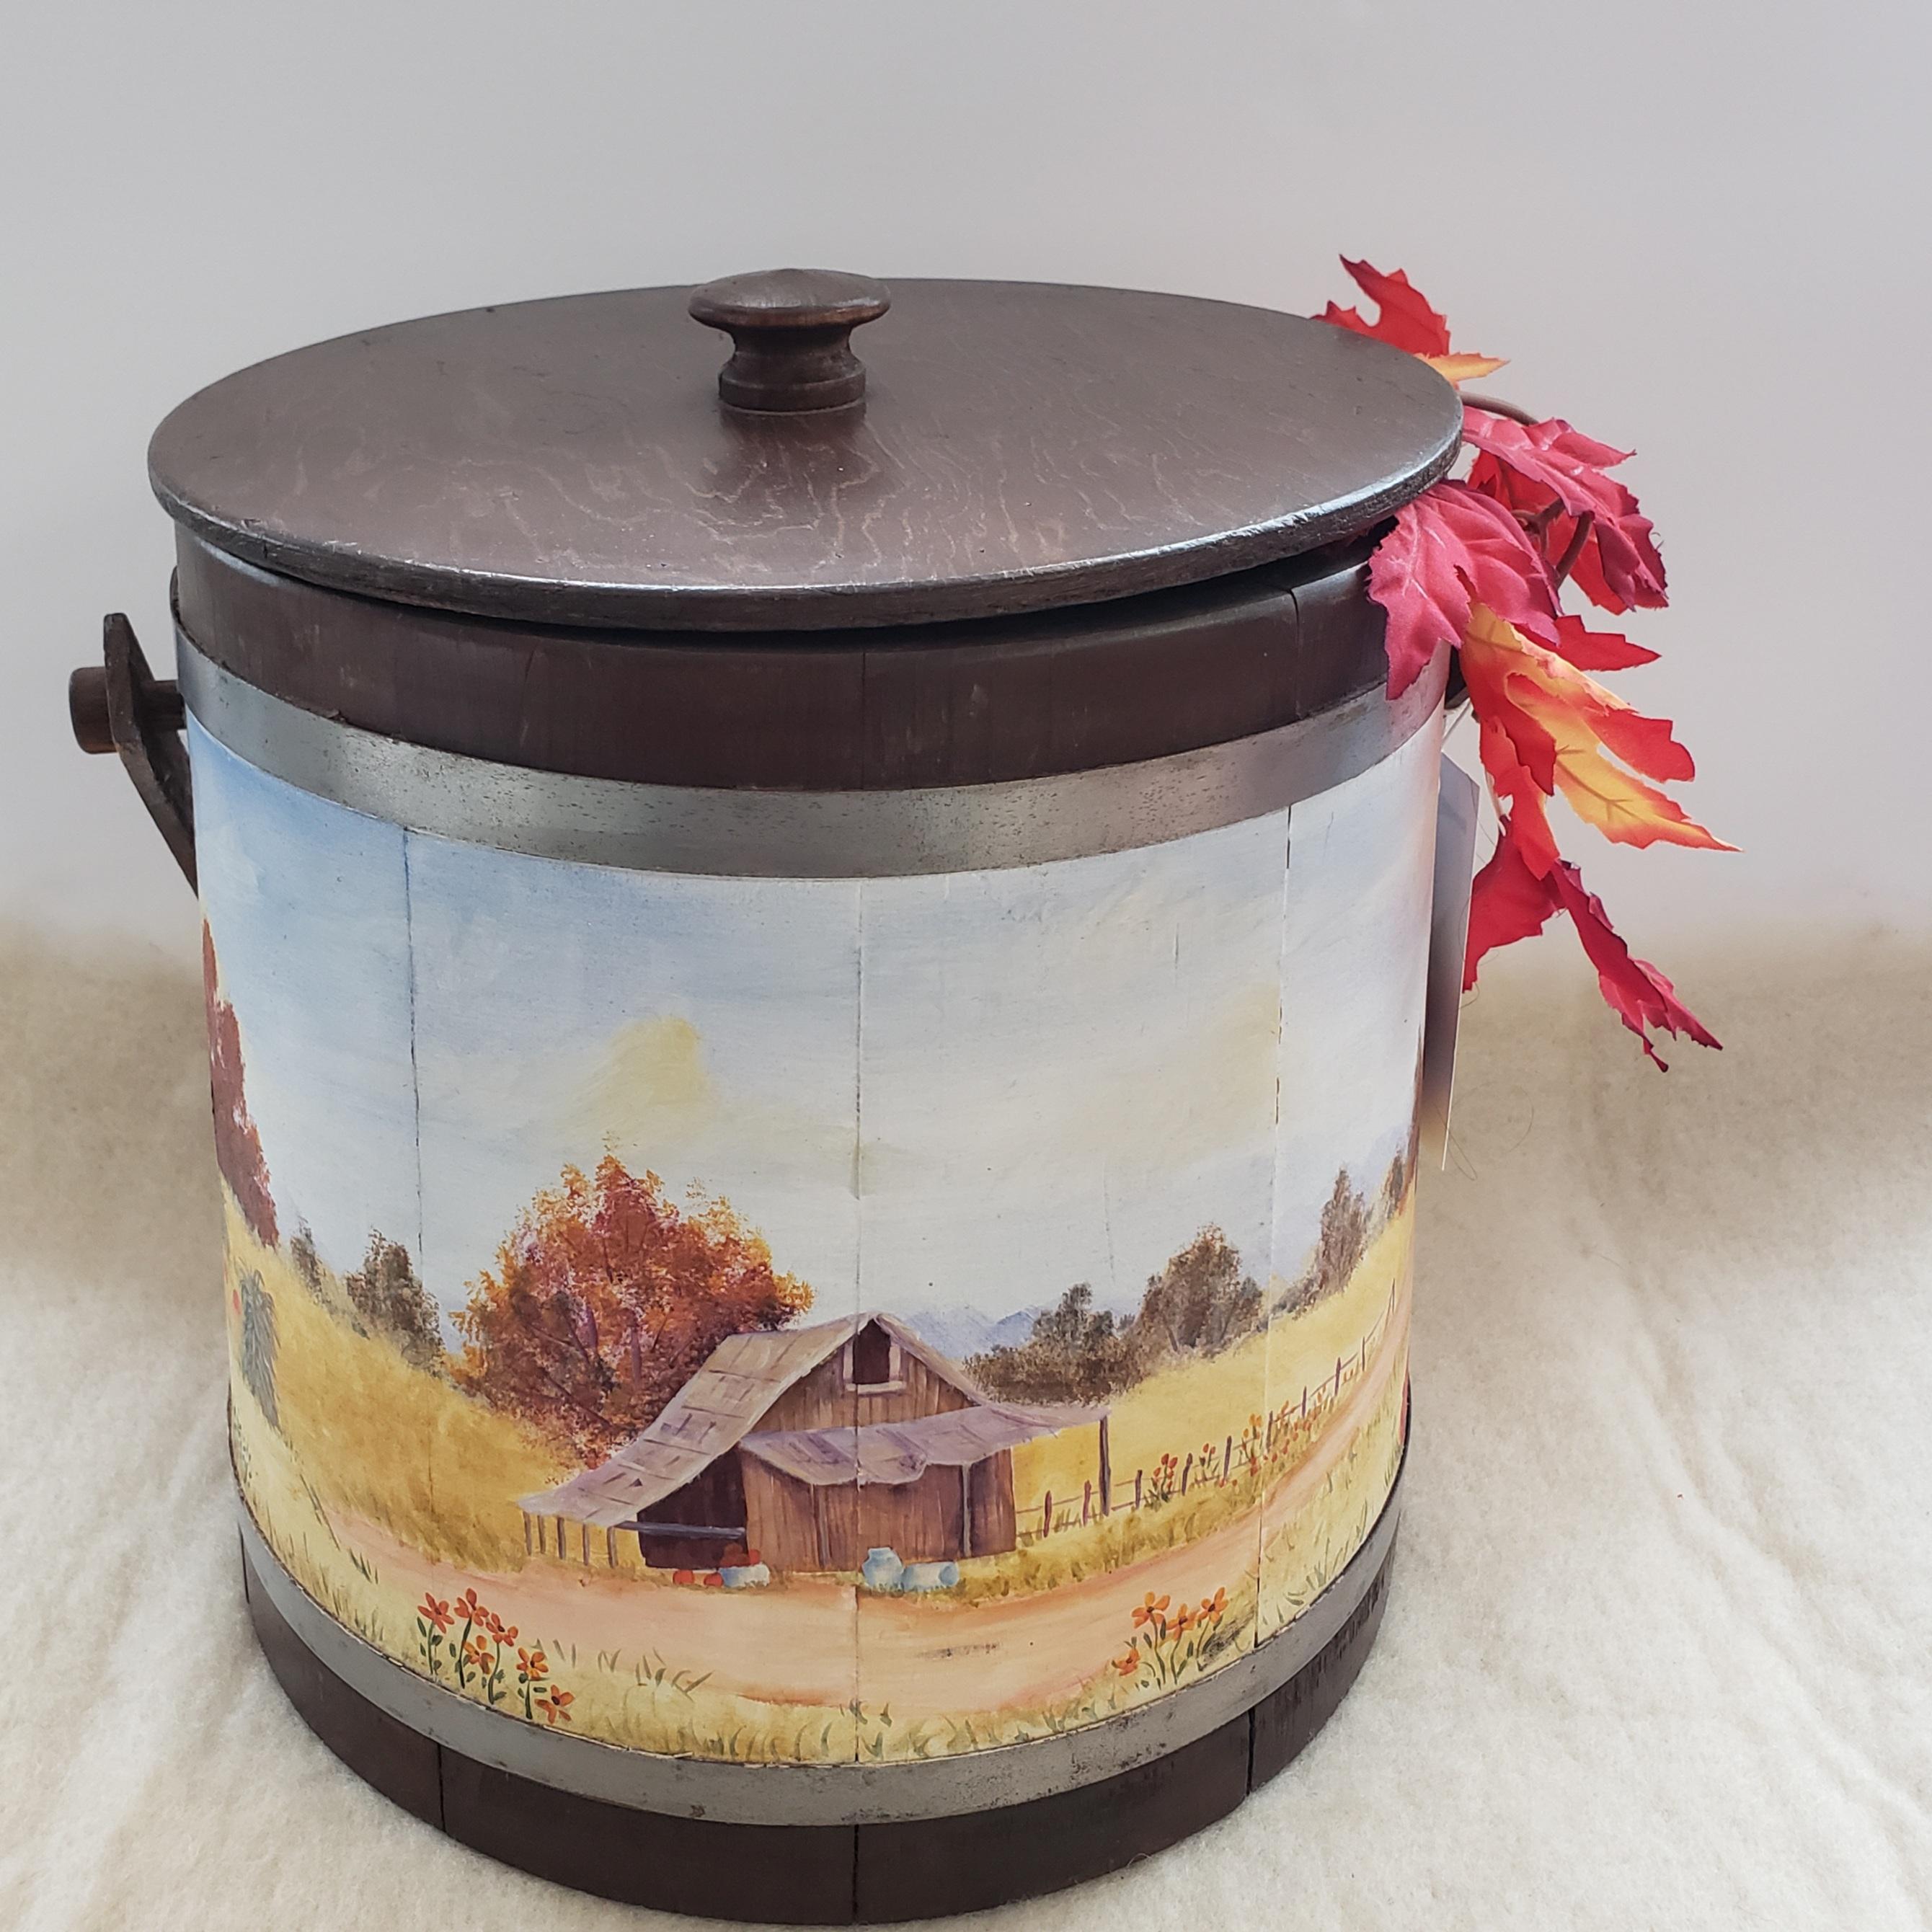 15 - Antique Sap Bucket